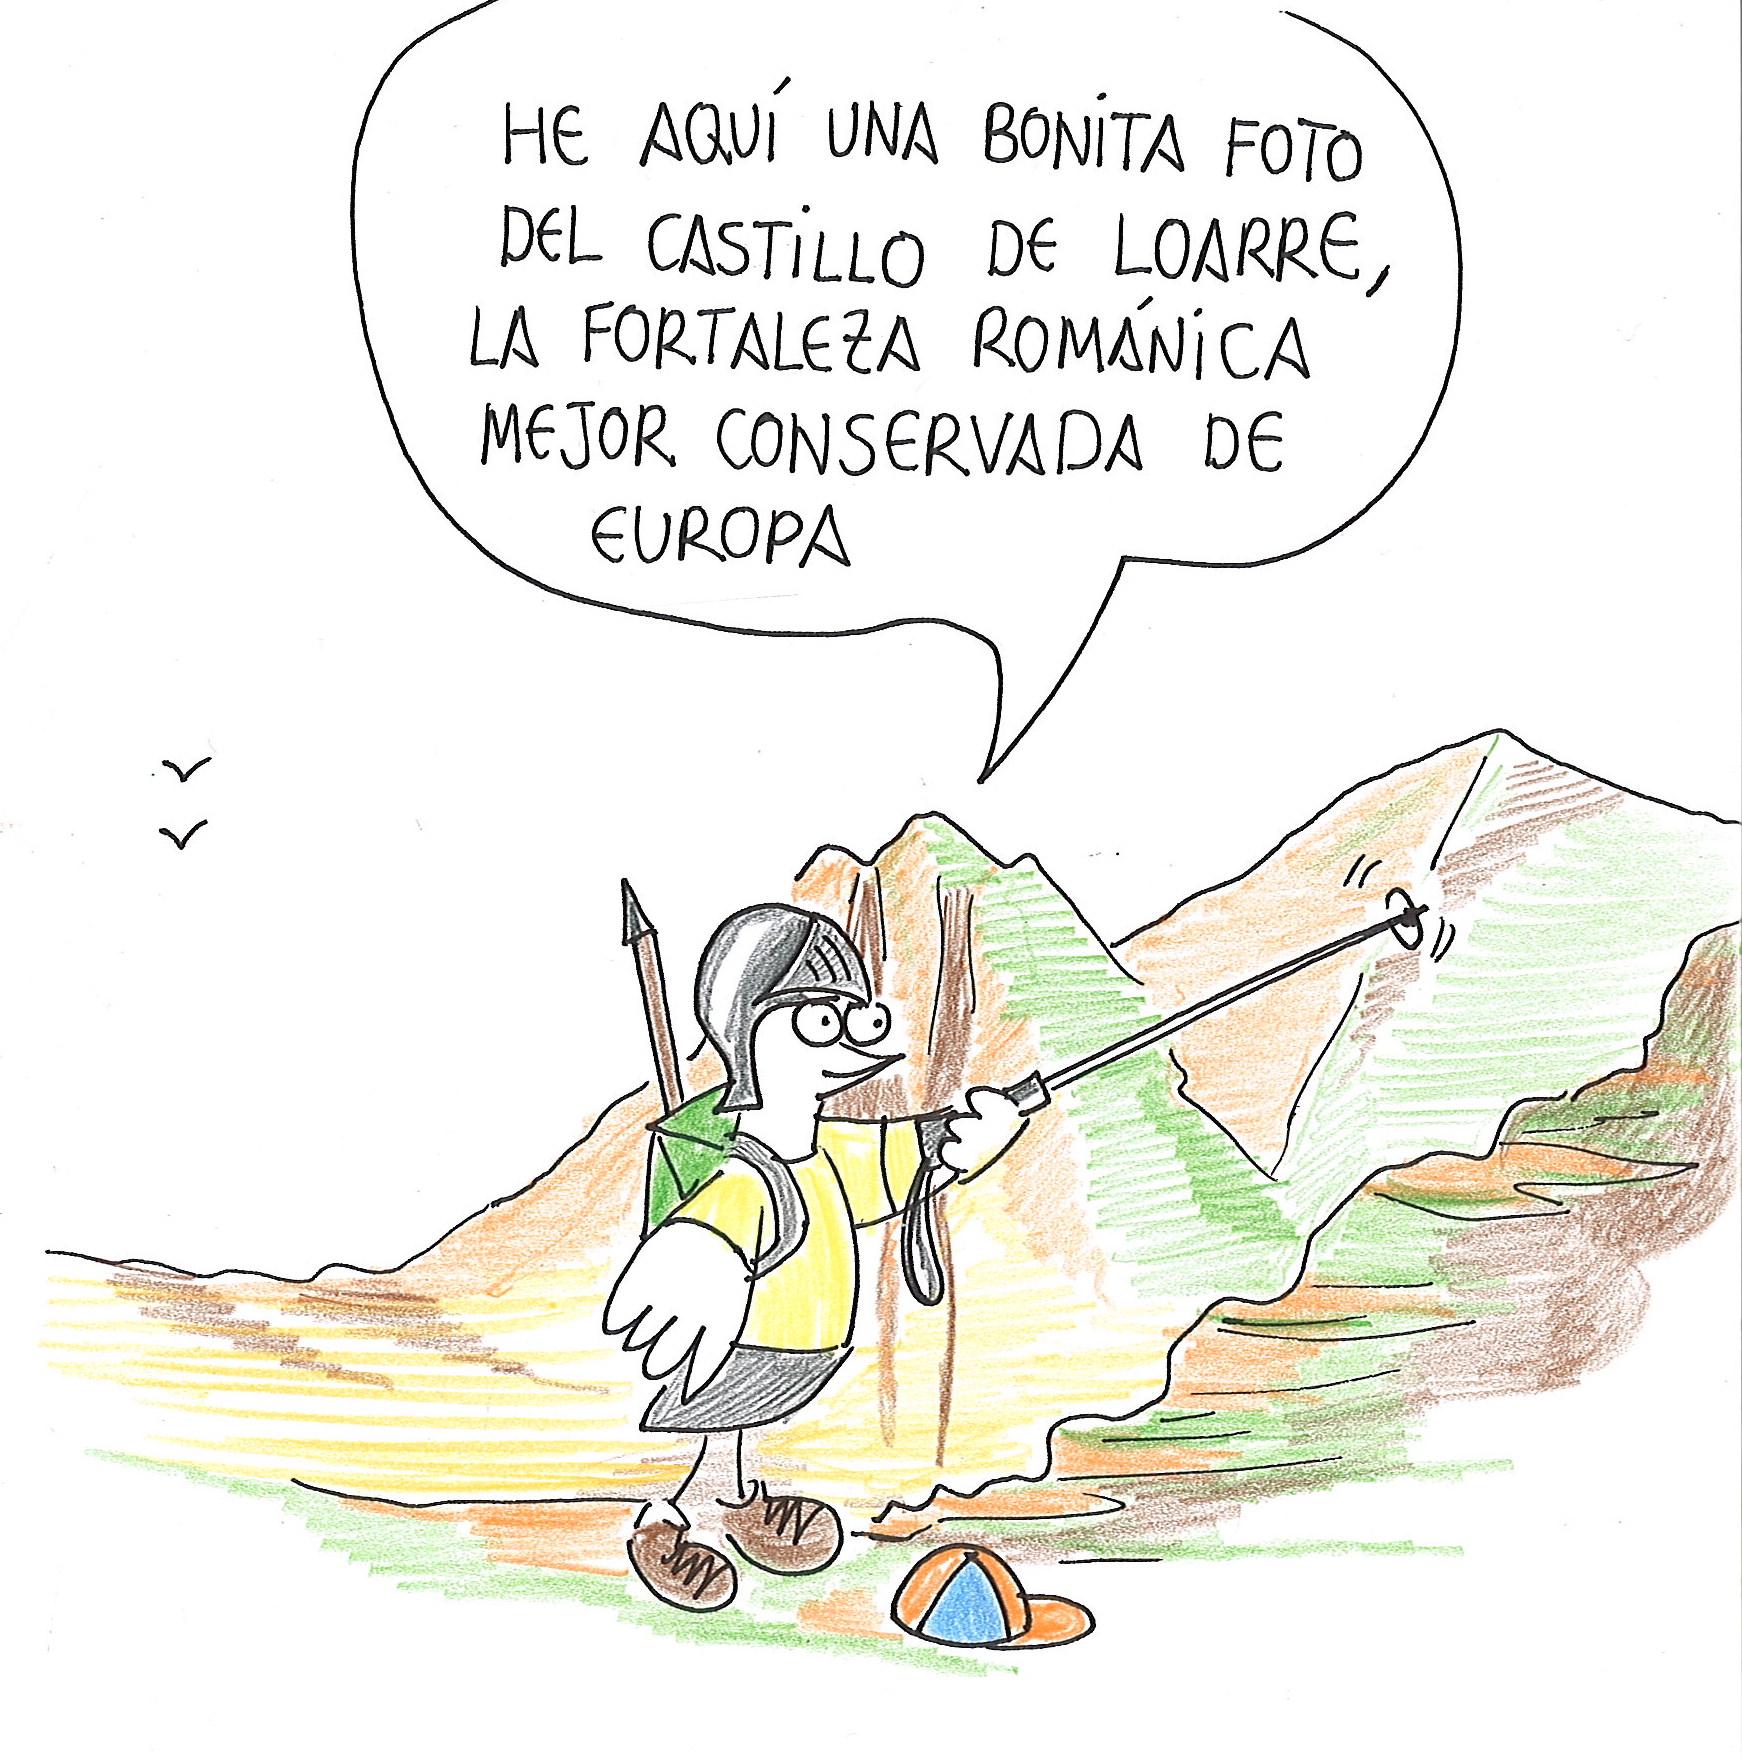 6-Castillo de Loarre b